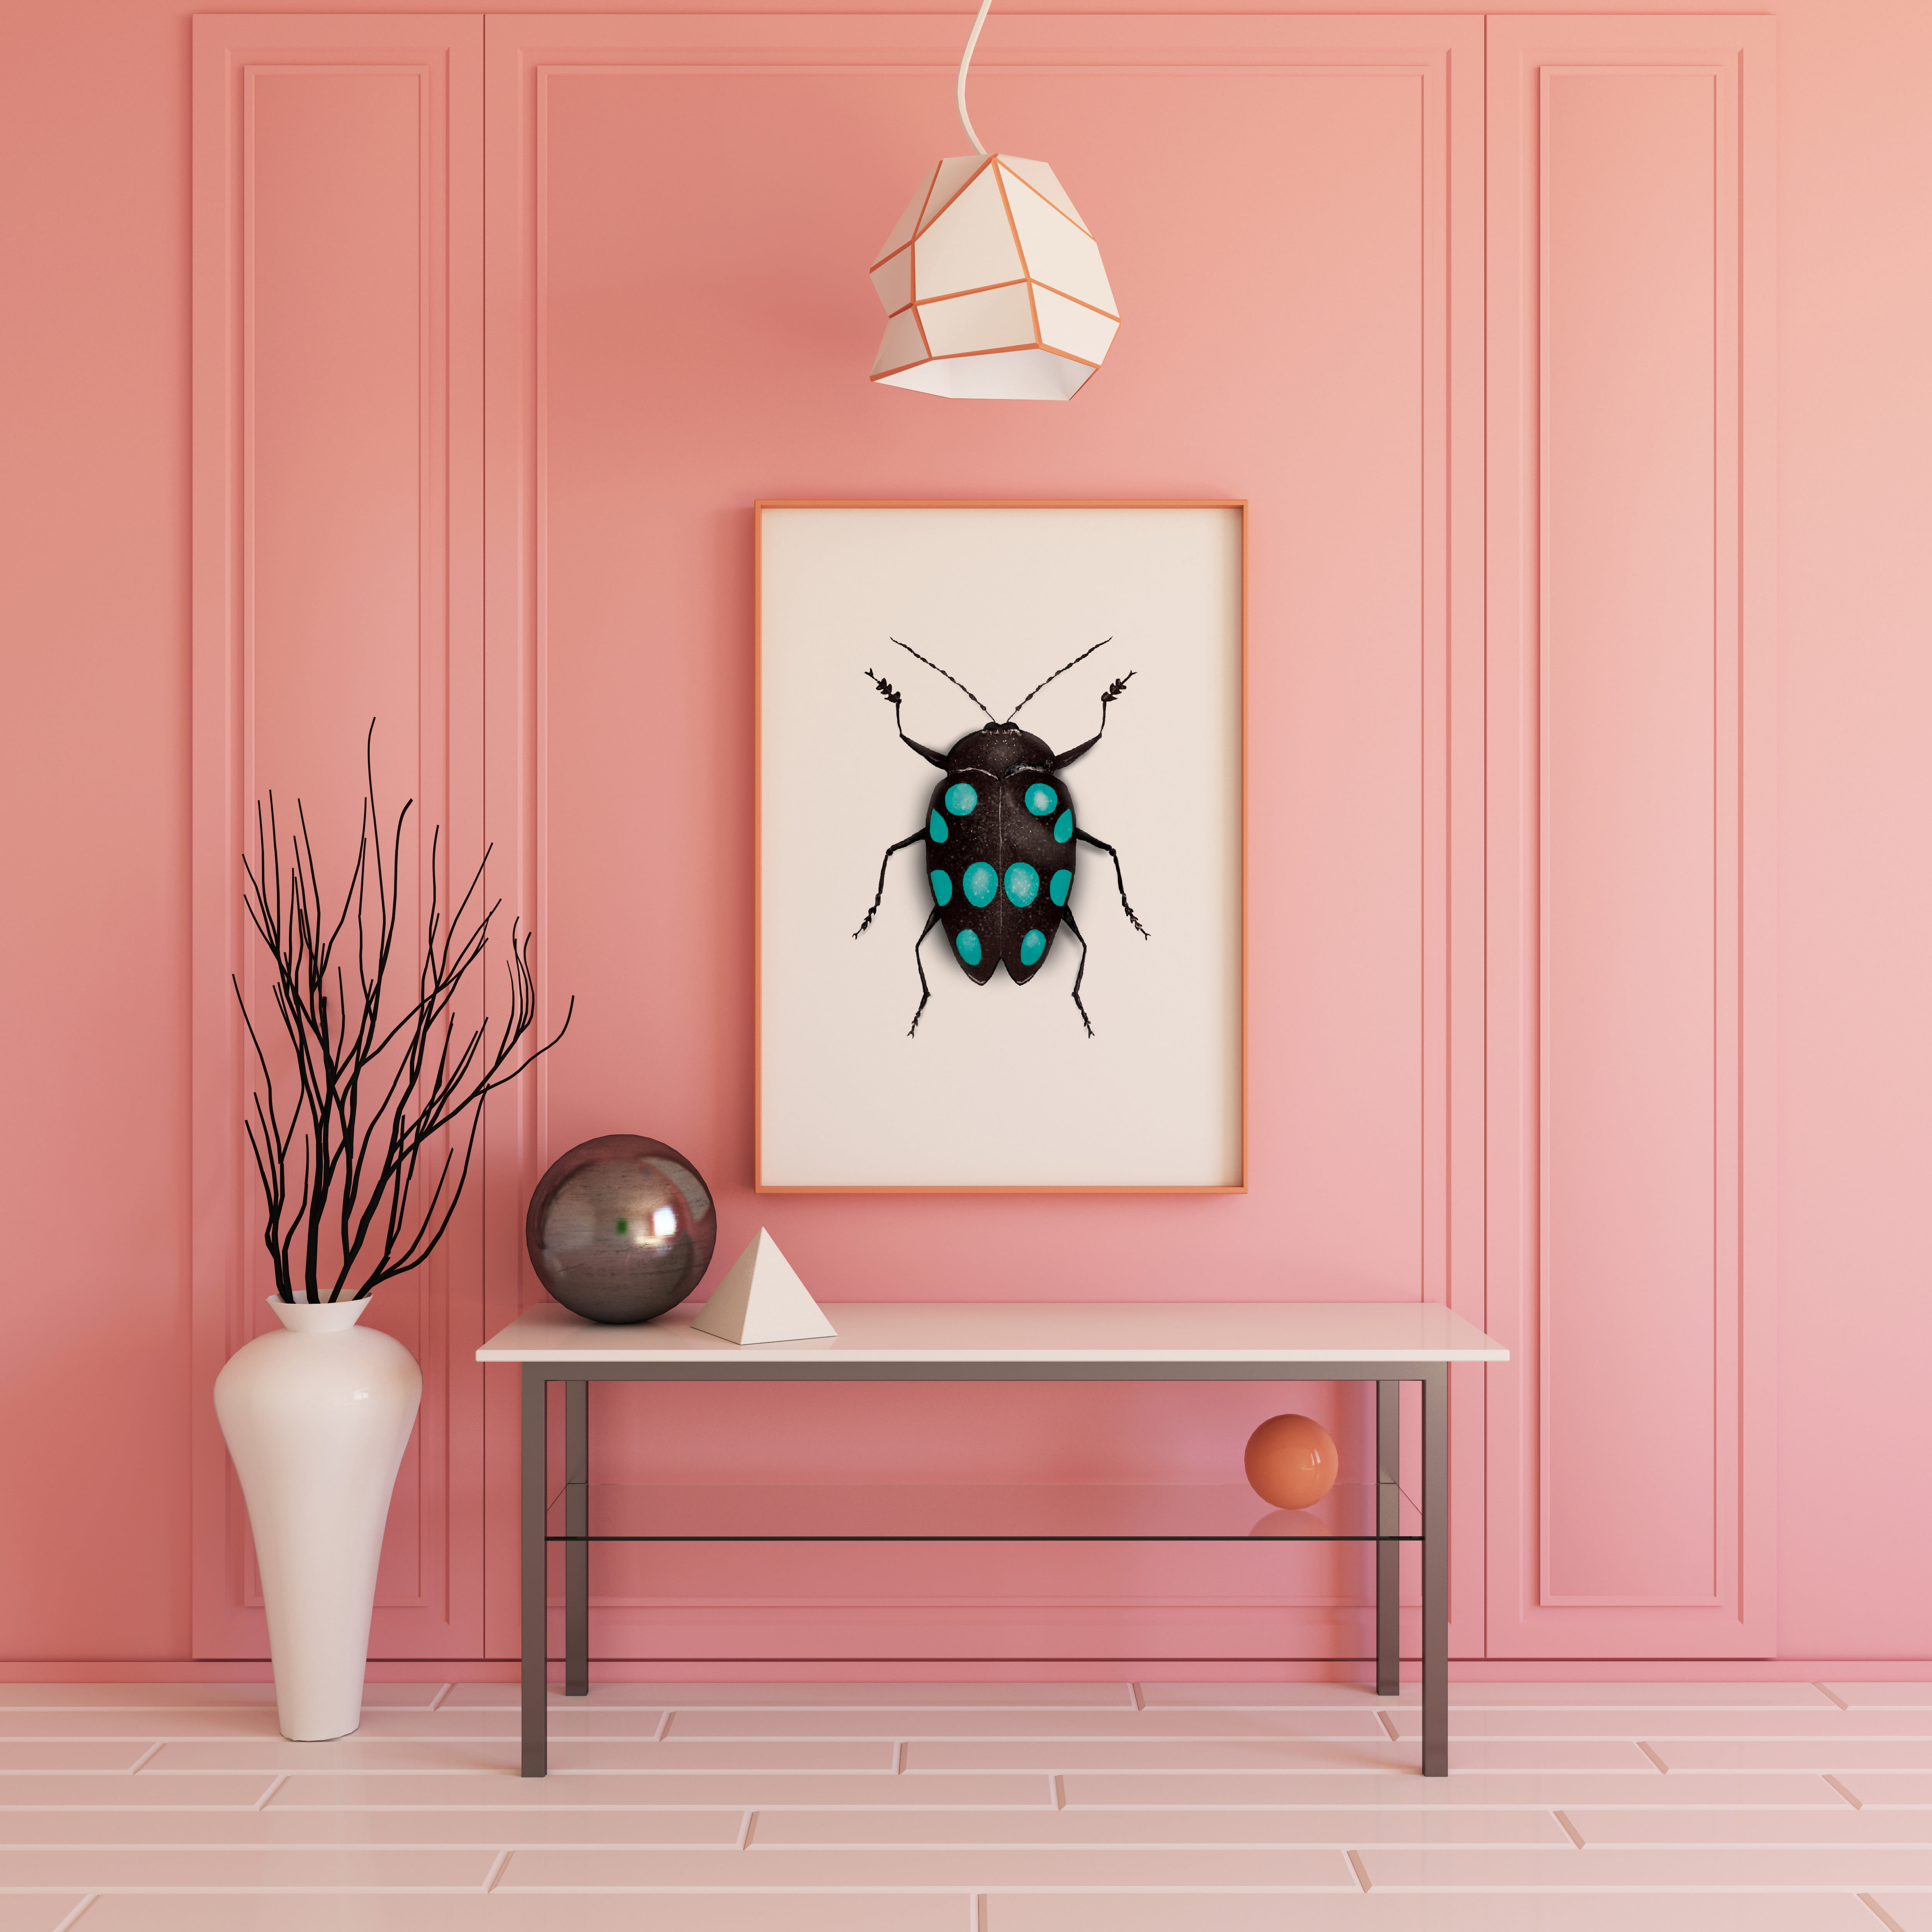 Beetle study 1 mopvna